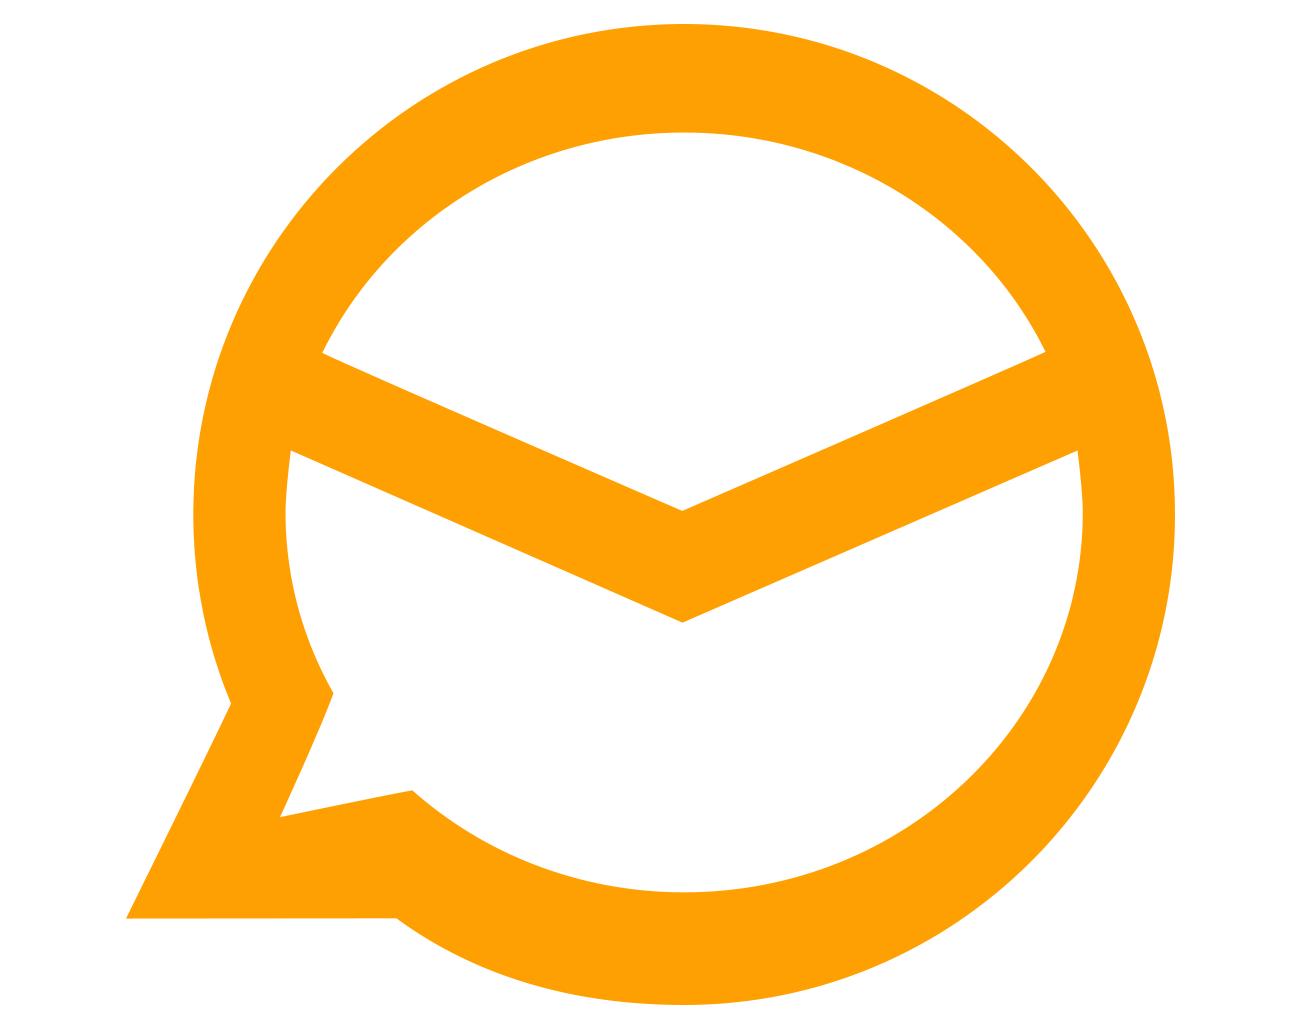 http://www.emclient.com/media/images/logos/emclient-large.png?v7